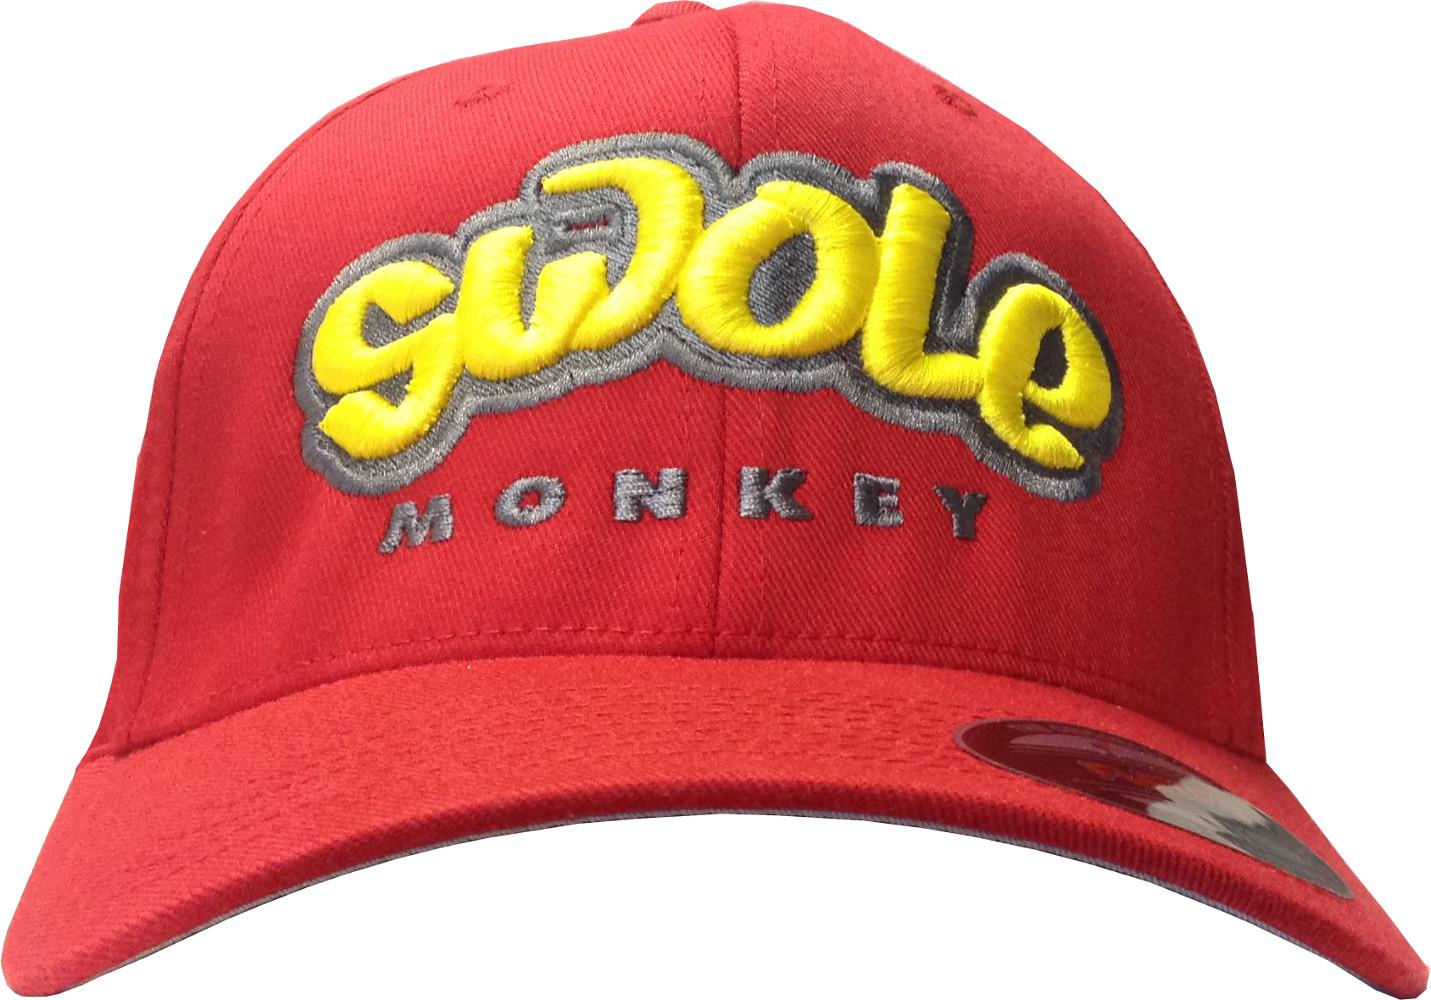 Cutler Athletics Swole Monkey Flexfit Hat - L/XL Red CA0006